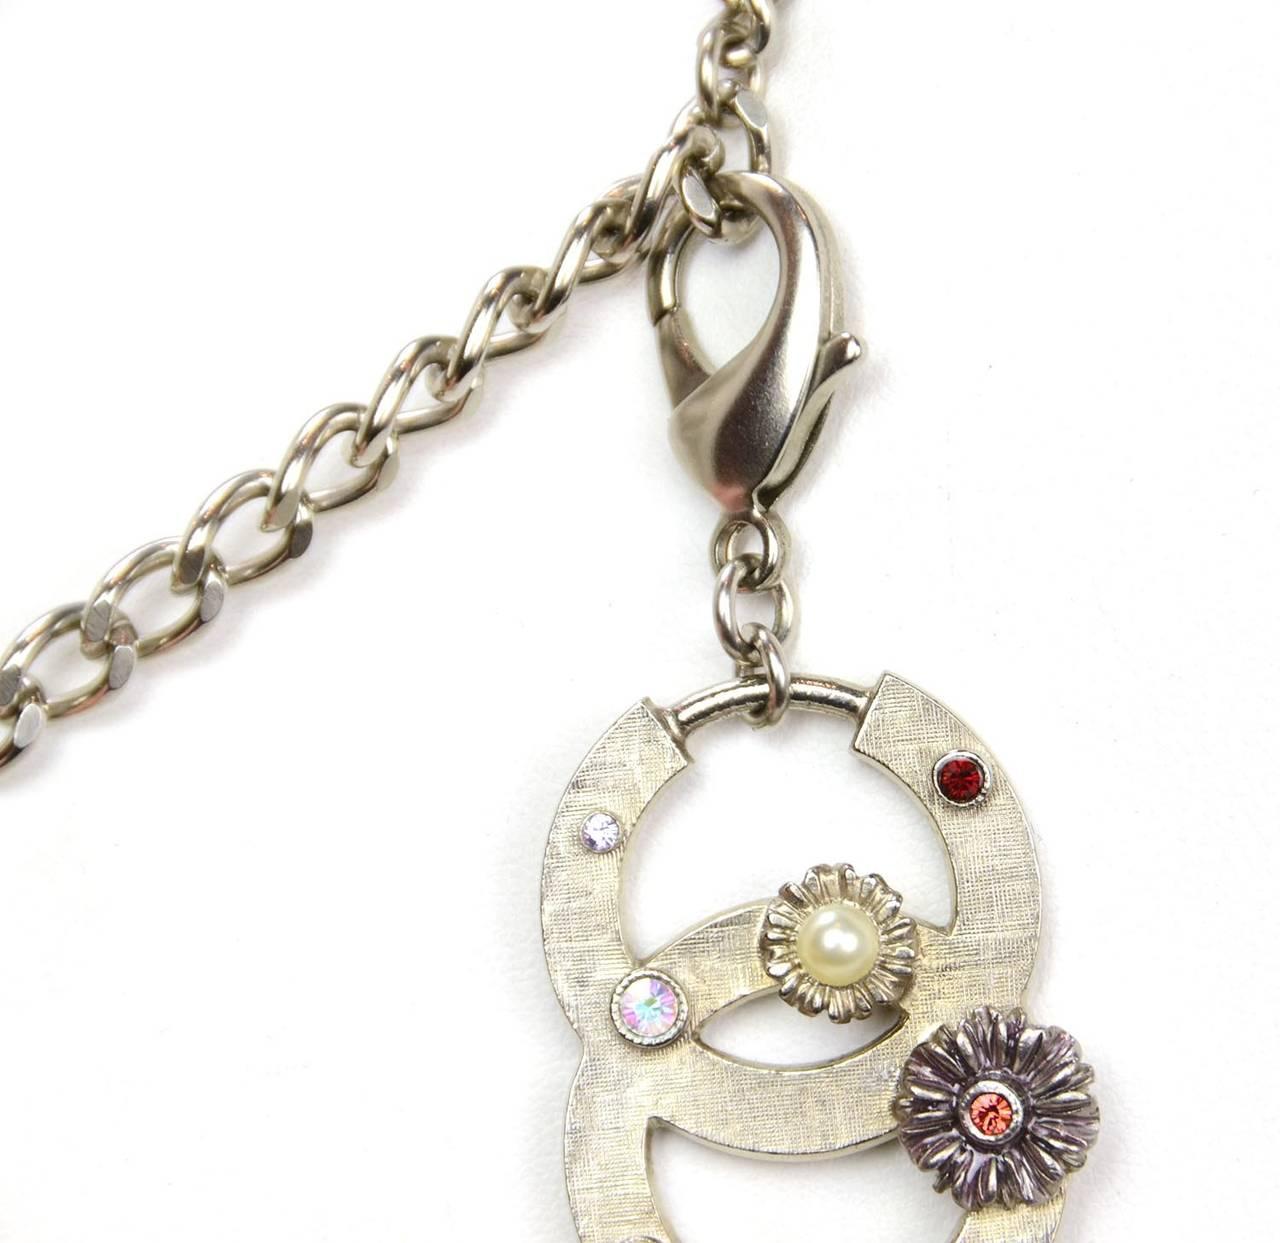 Chanel 2005 Silver Chain Link Belt/Necklace w/Flower & CC Pendants 3